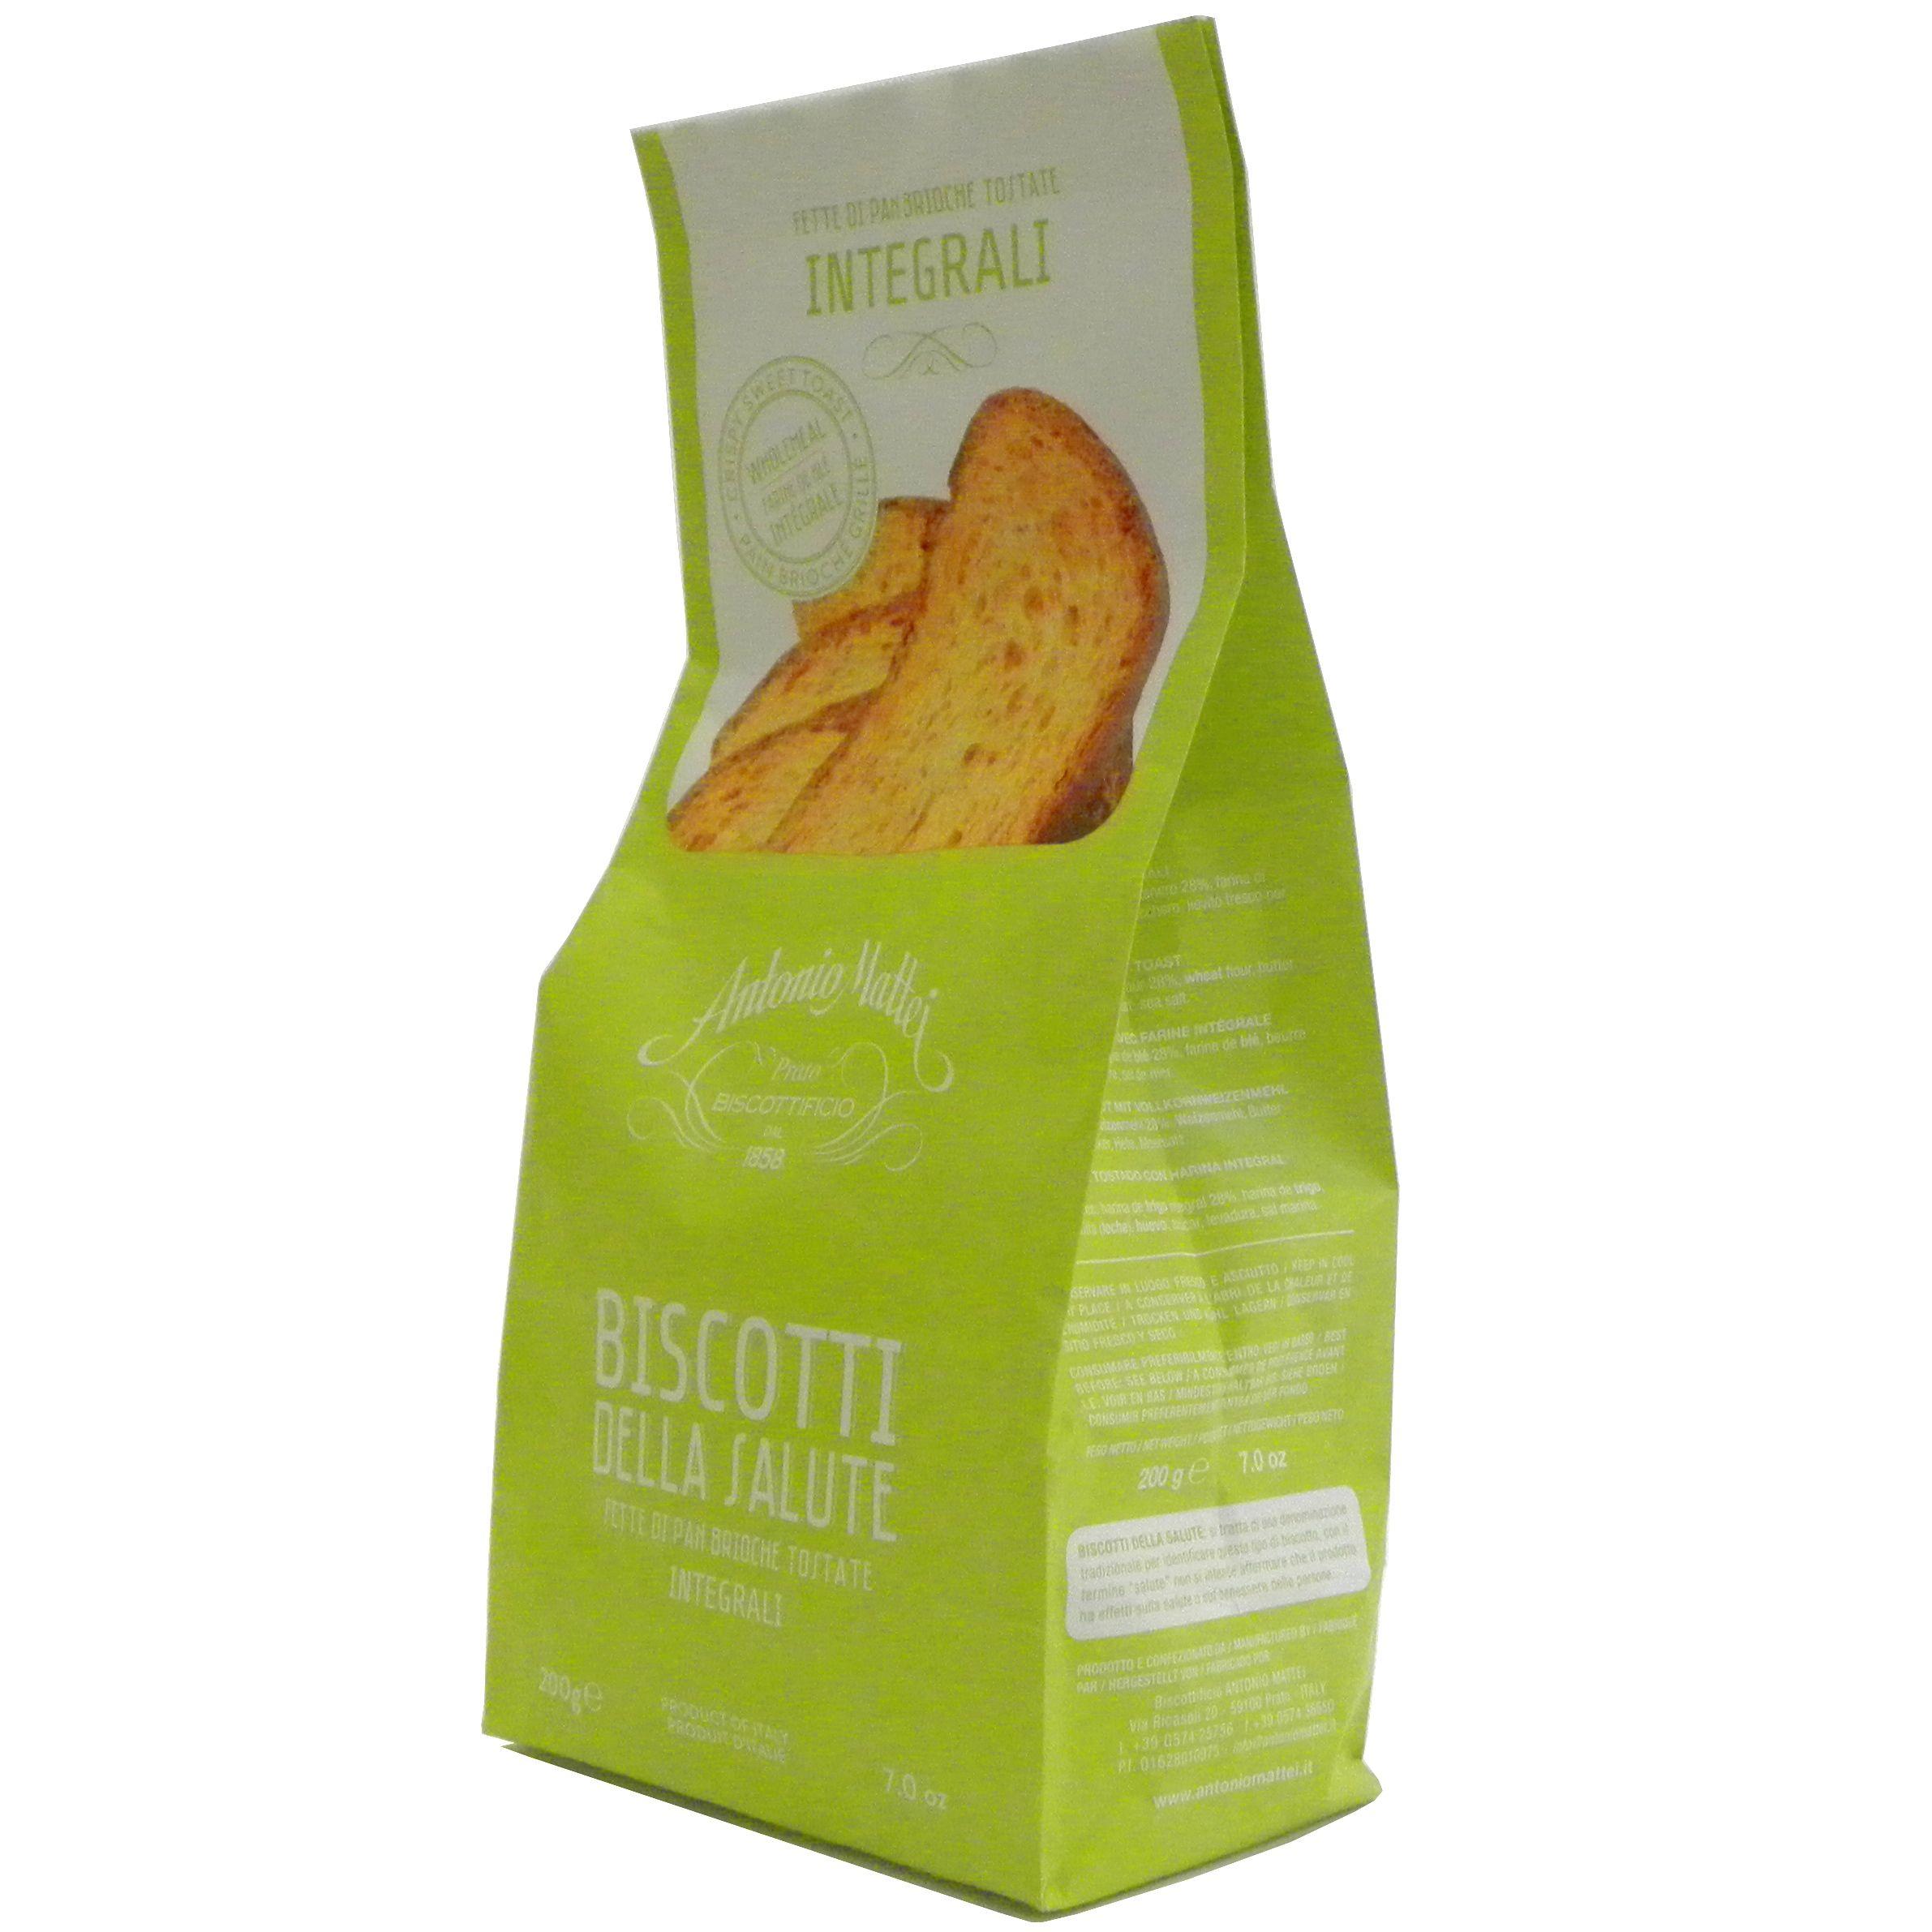 Biscotti Salute Integrali Mattei – Whole wheat Grilled Bread Mattei – Gustorotondo – Italian food boutique